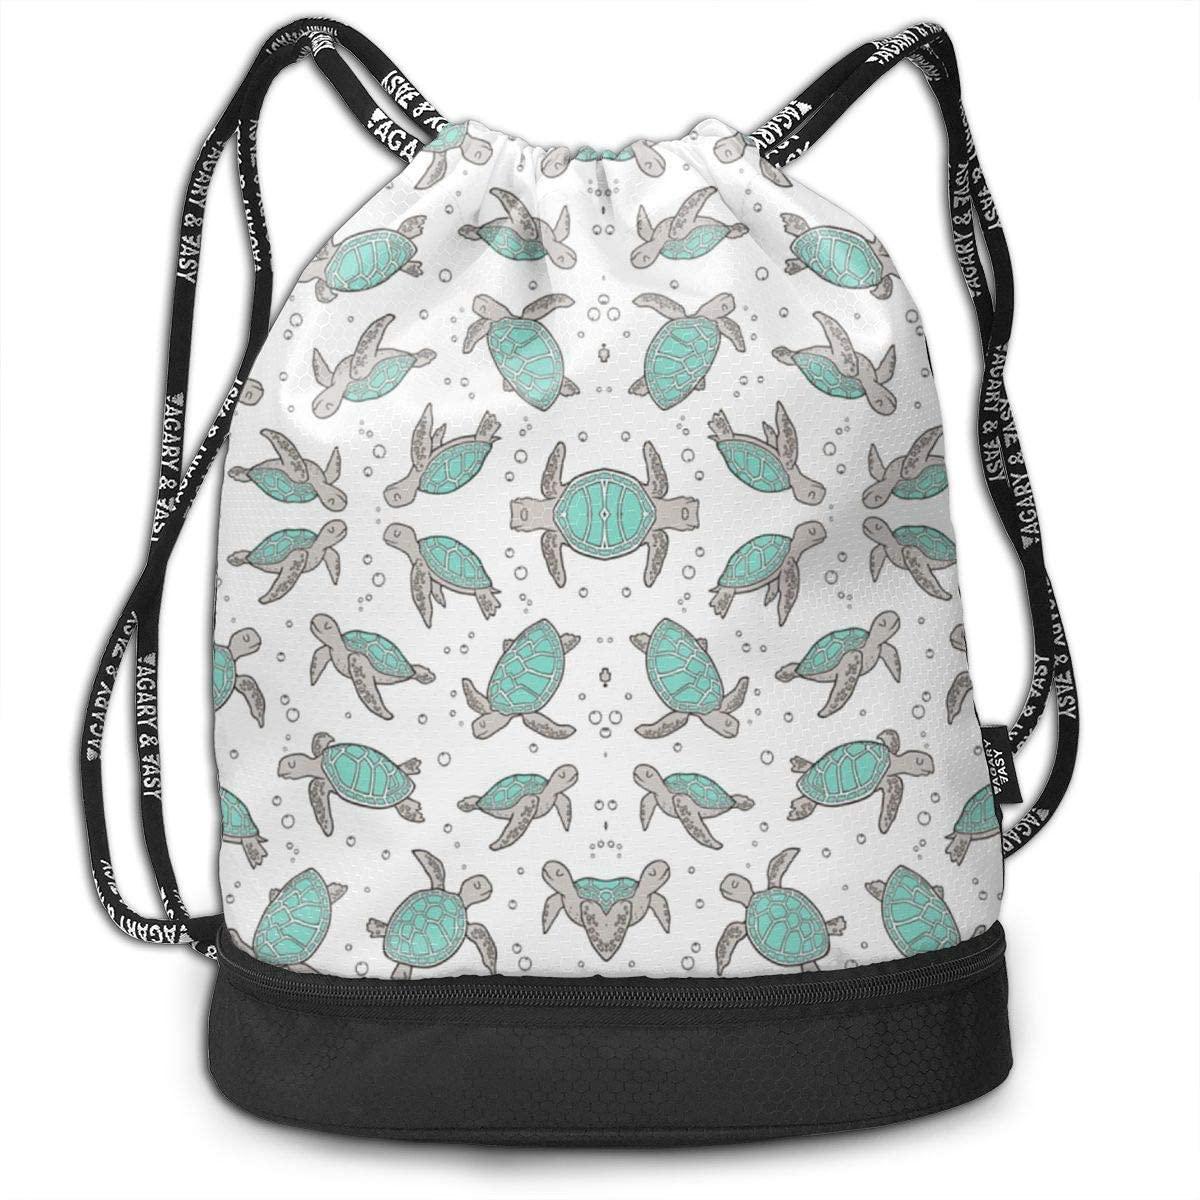 XUJ YOGA Drawstring Backpack Sports Sackpack for Men Women Children Large Size